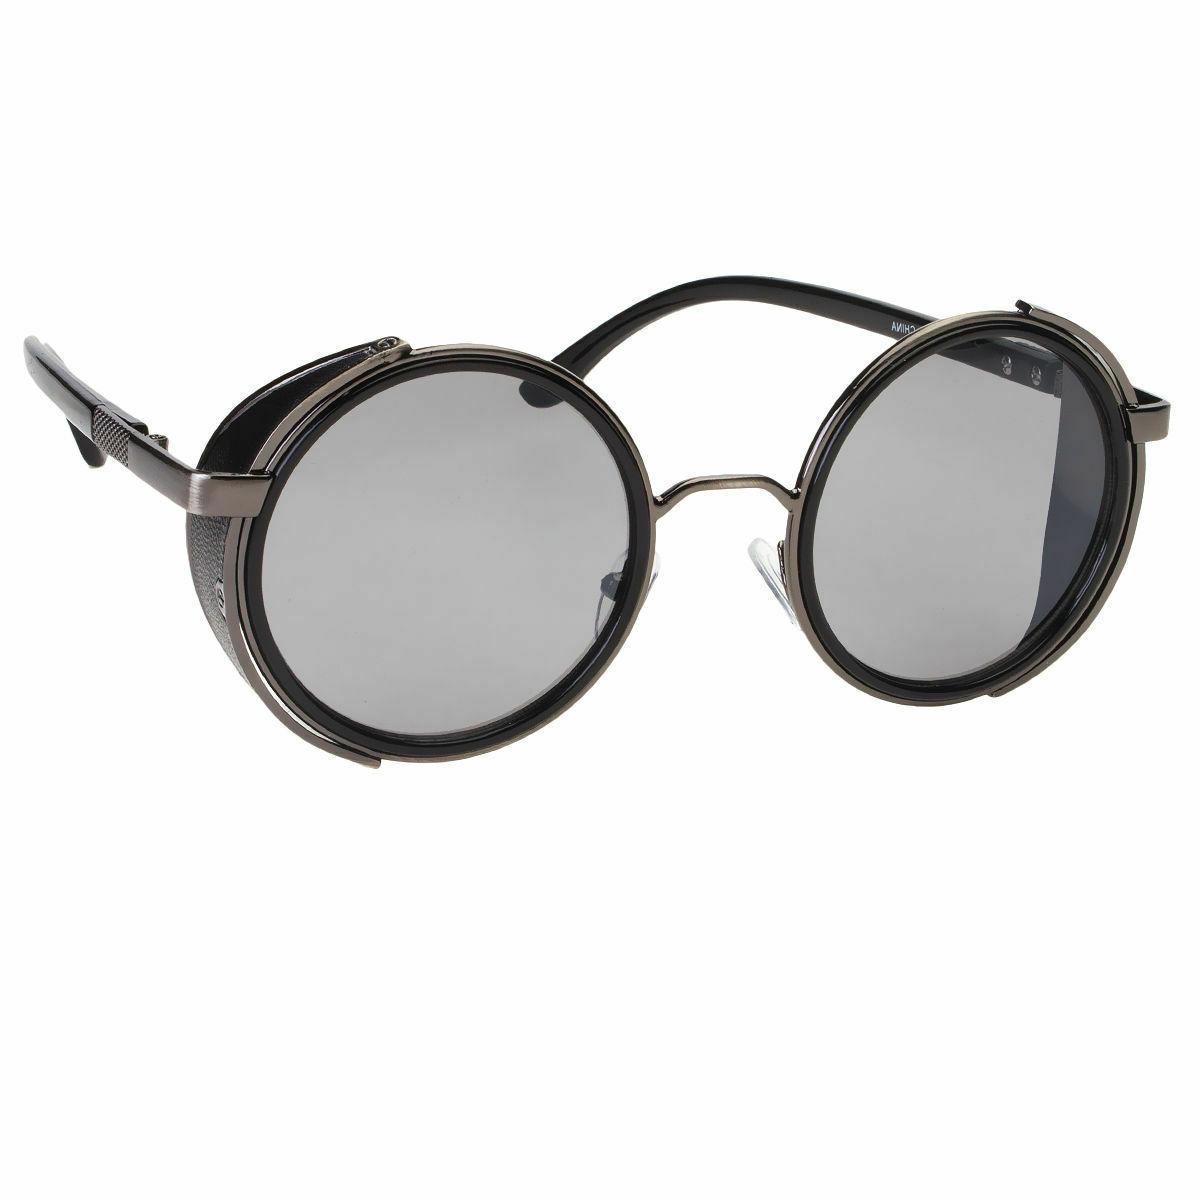 Vintage Sunglasses Steampunk Sun Glasses